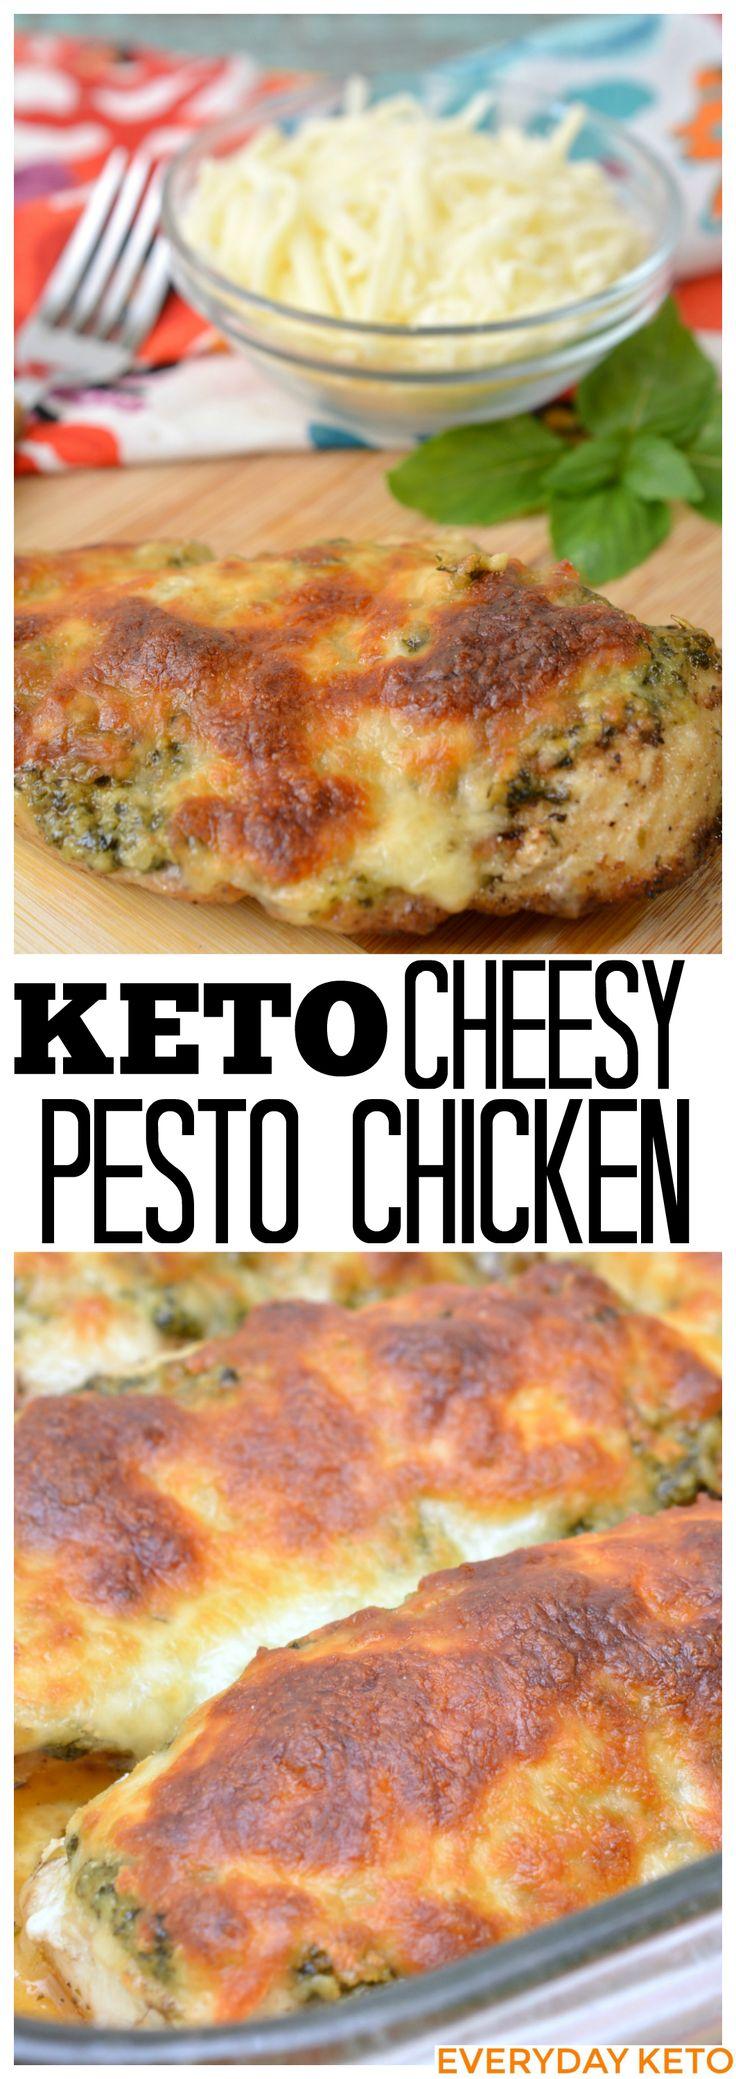 Keto Friendly Cheesy Pesto Chicken